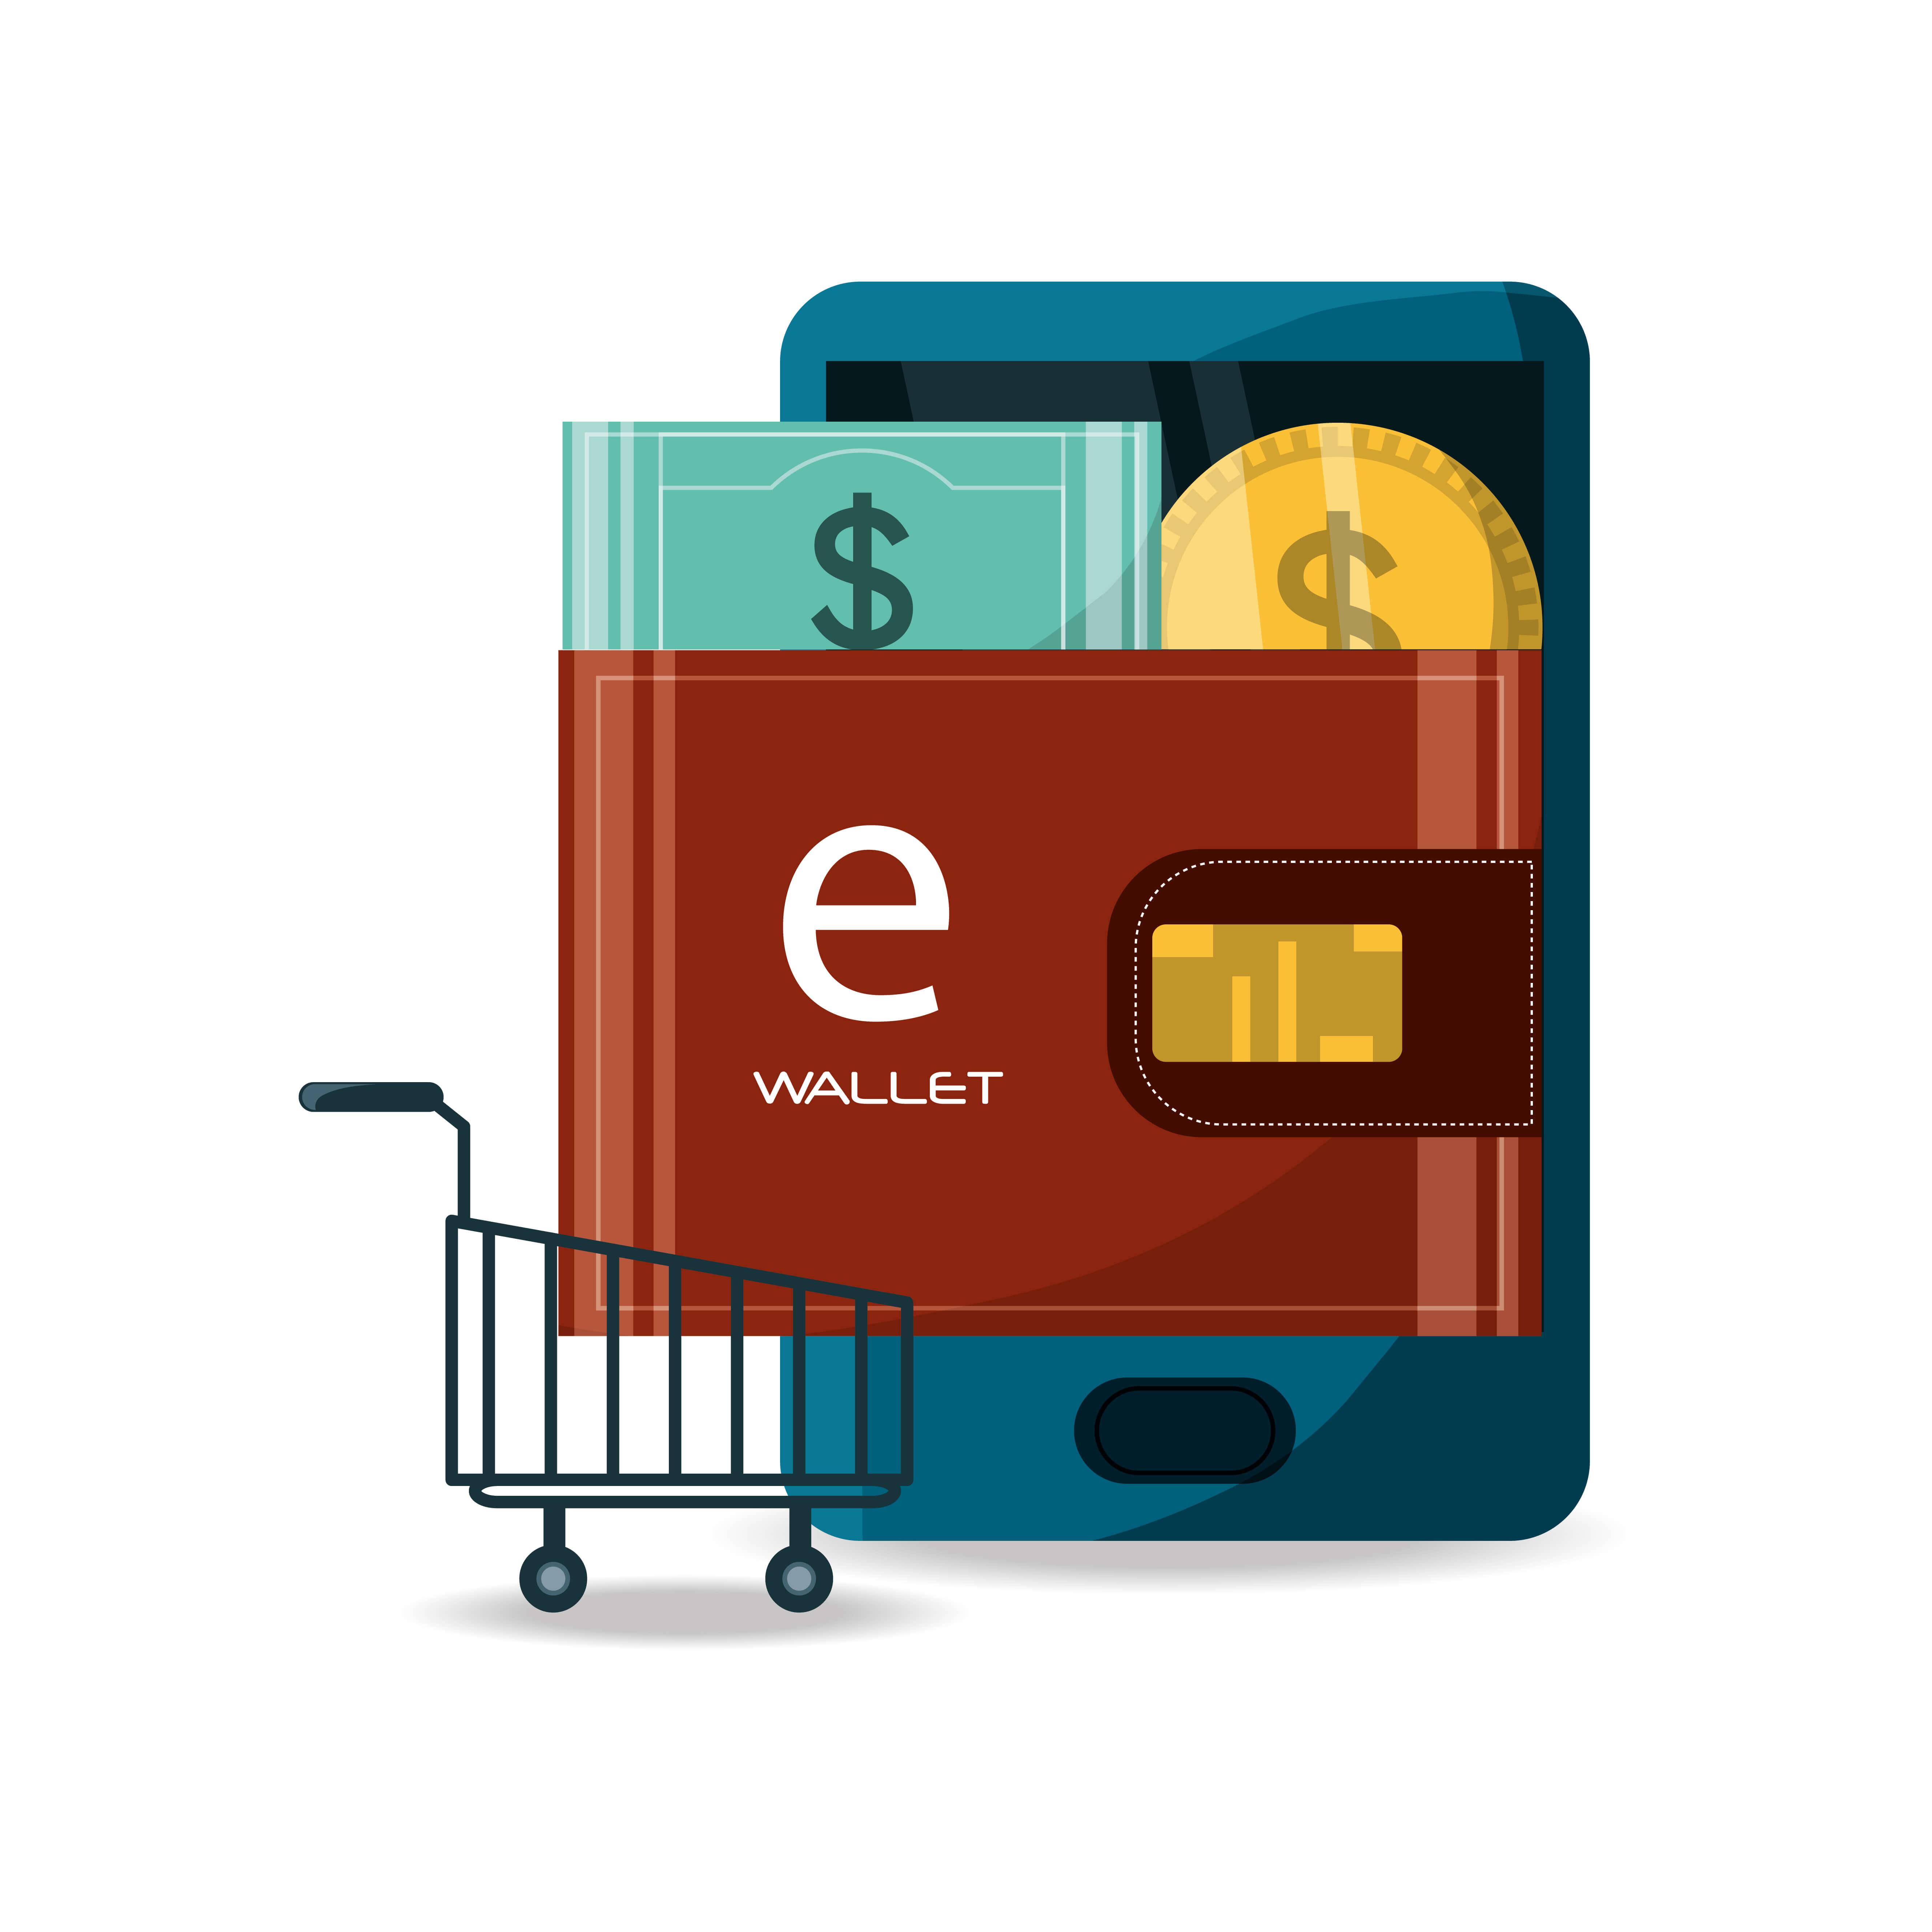 seo plan for ecommerce website